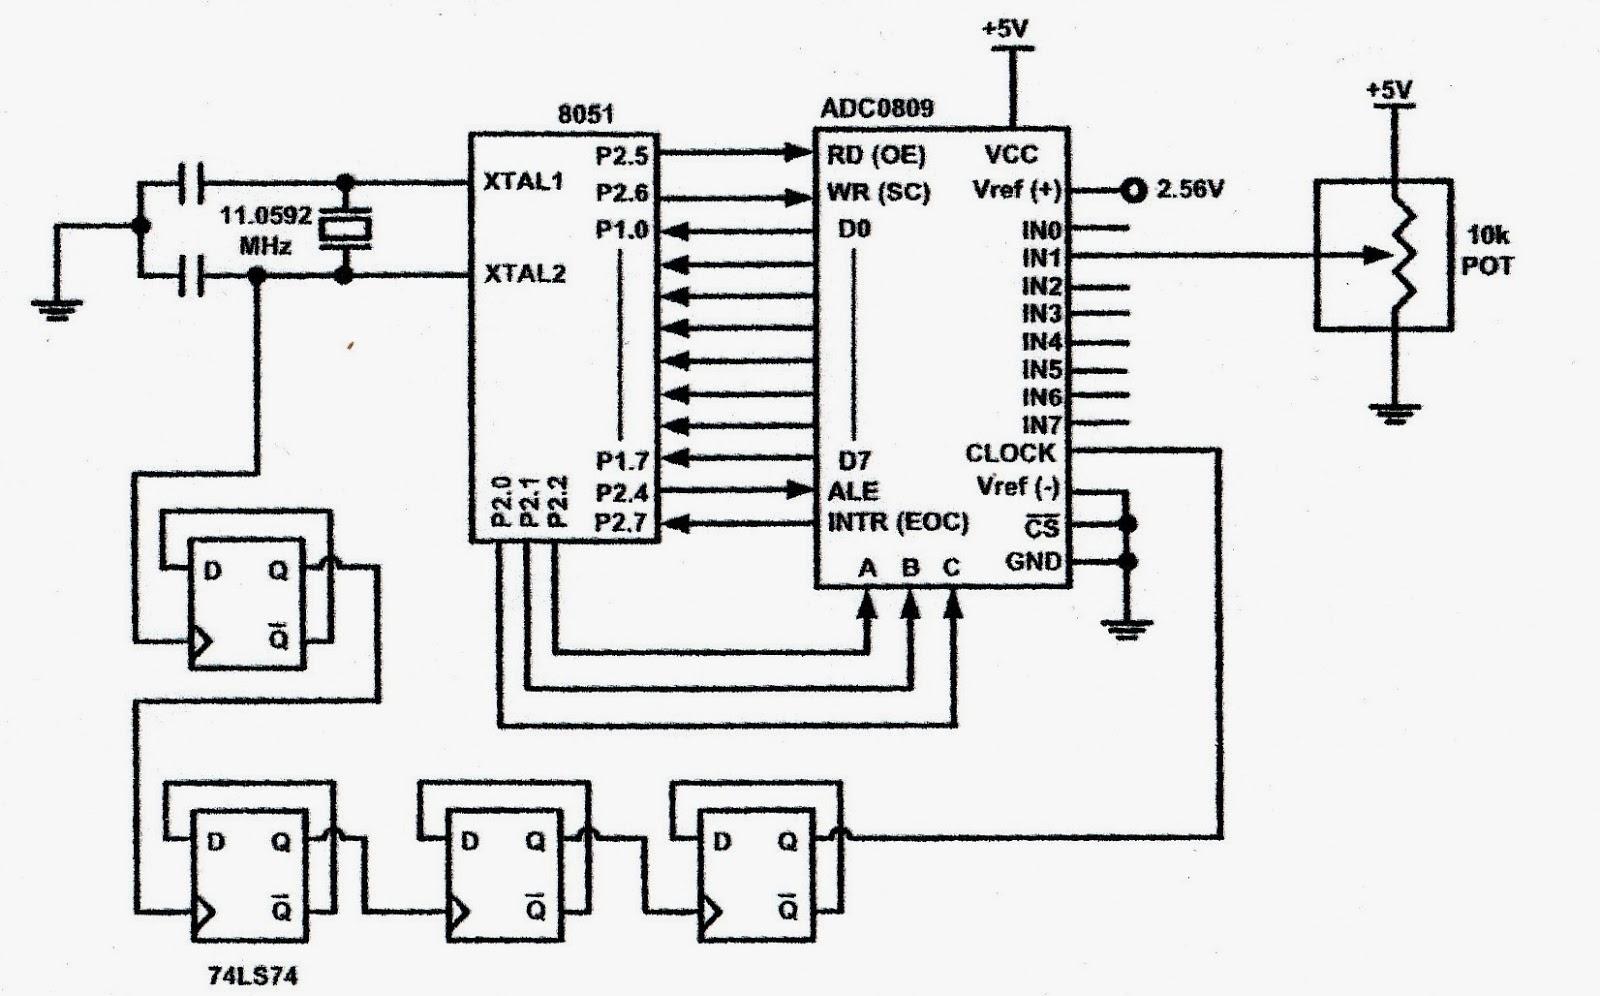 block diagram of adc0809 wiring diagram blog block diagram of adc0809 [ 1600 x 996 Pixel ]